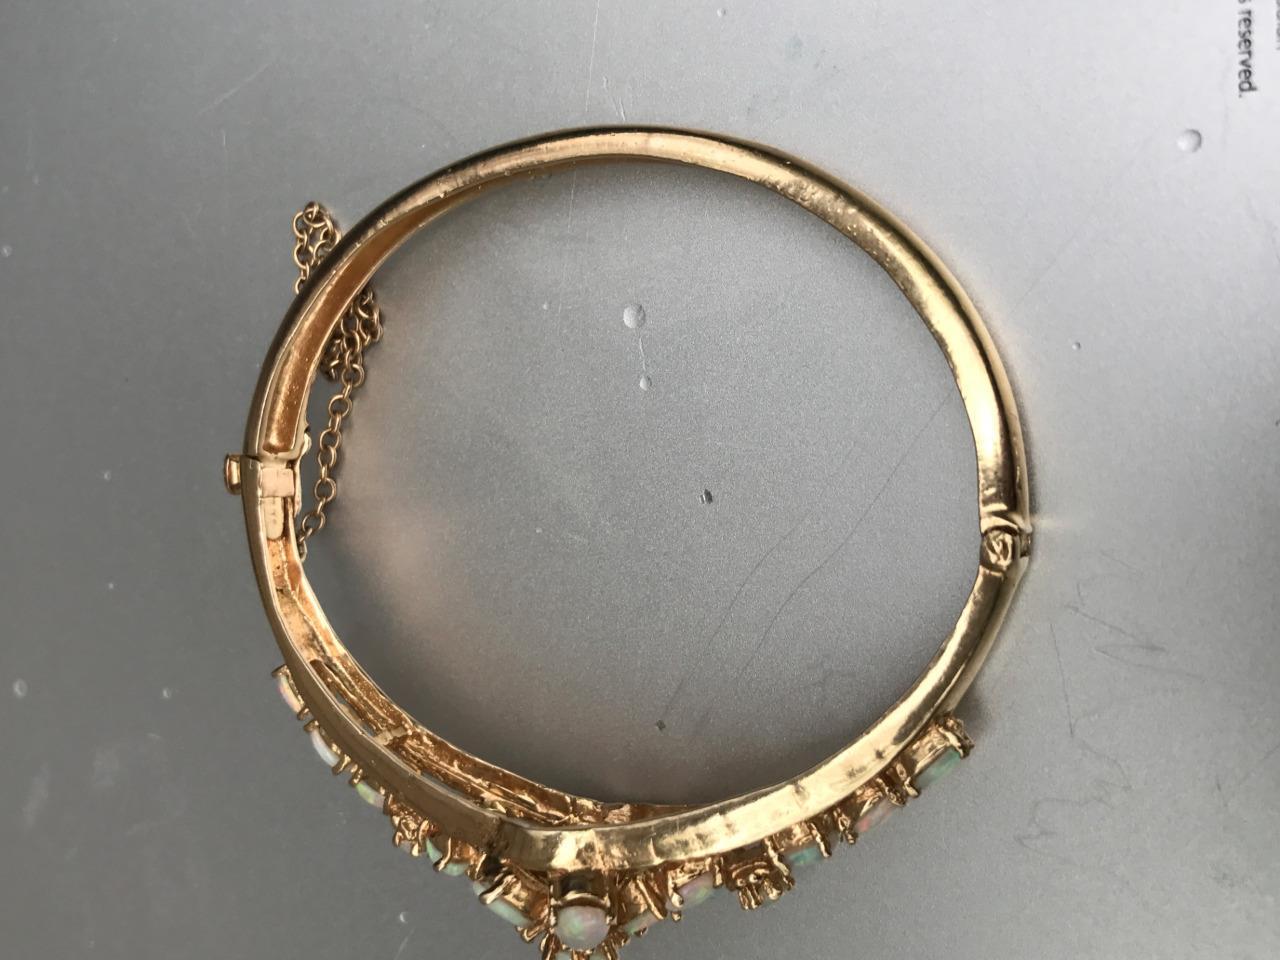 Vintage Gorgeous! Estate 14k Yellow Gold Opal Floral. Skull Medallion. Amazing Bracelet. White Rings. Emerald Infinity Band. October Necklace. Hawk Watches. Silver Bangle Cuff Bracelet. Swarovski Beads